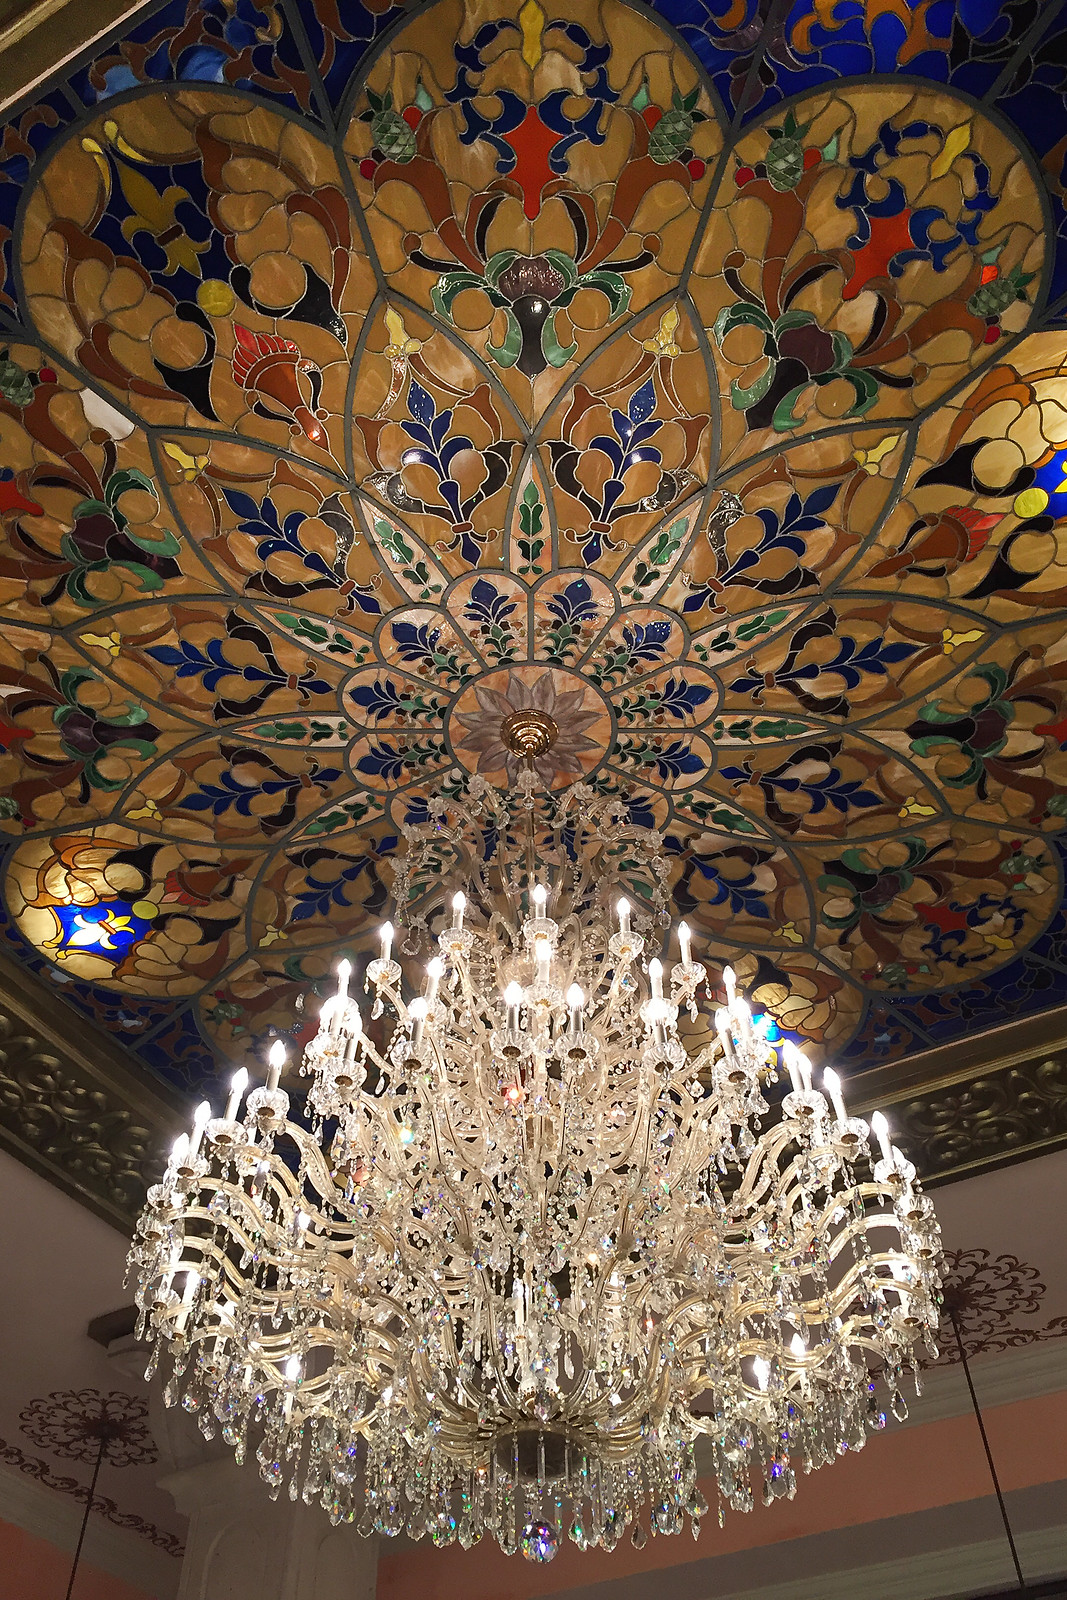 Riu Palace Riviera Maya - Chandelier in Lobby